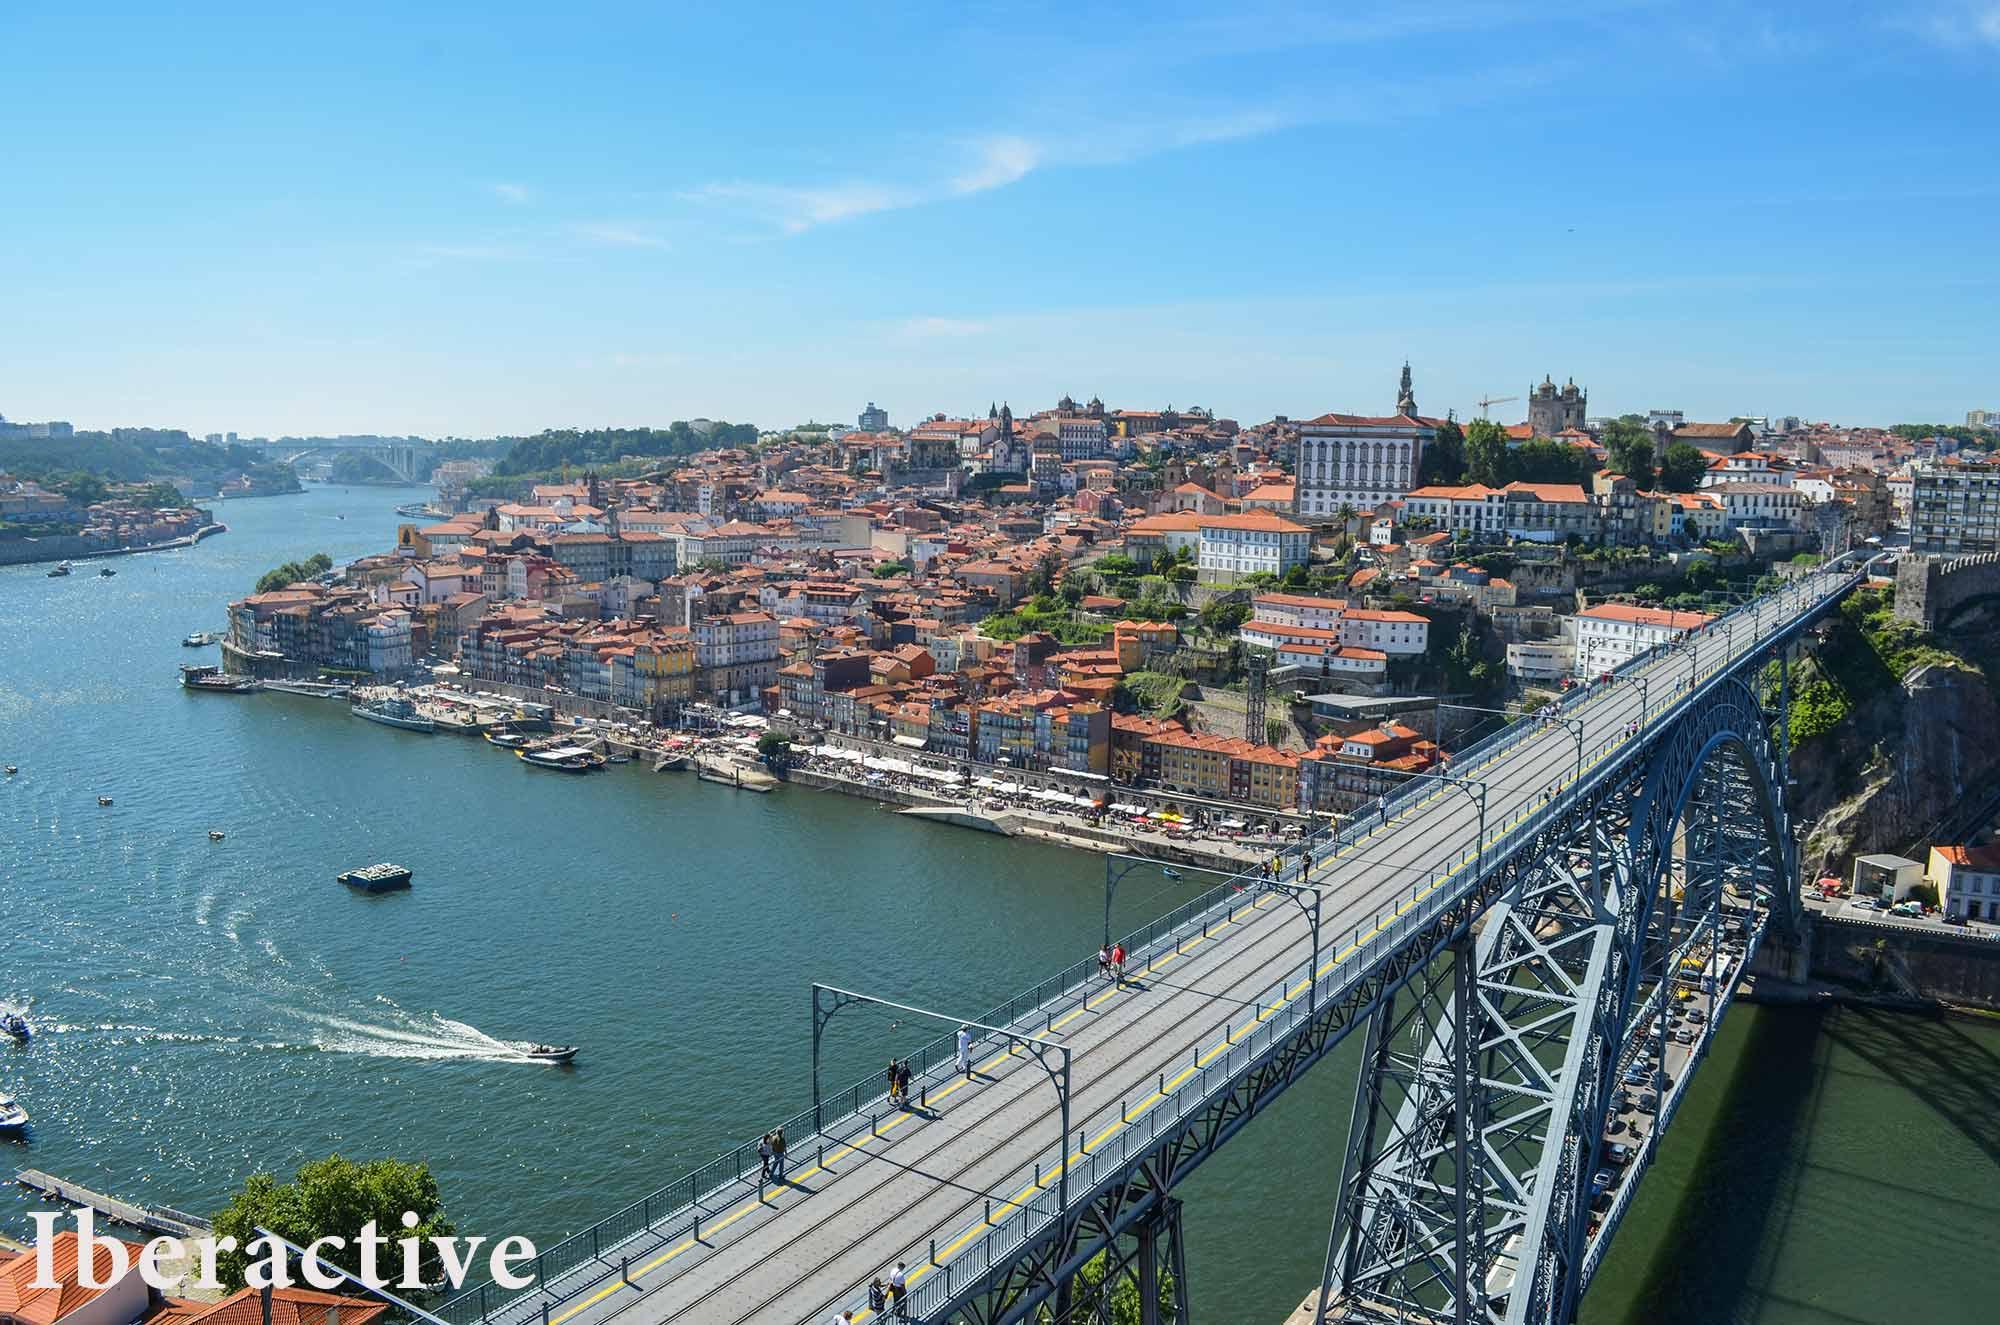 iberactive-portugal--(28)